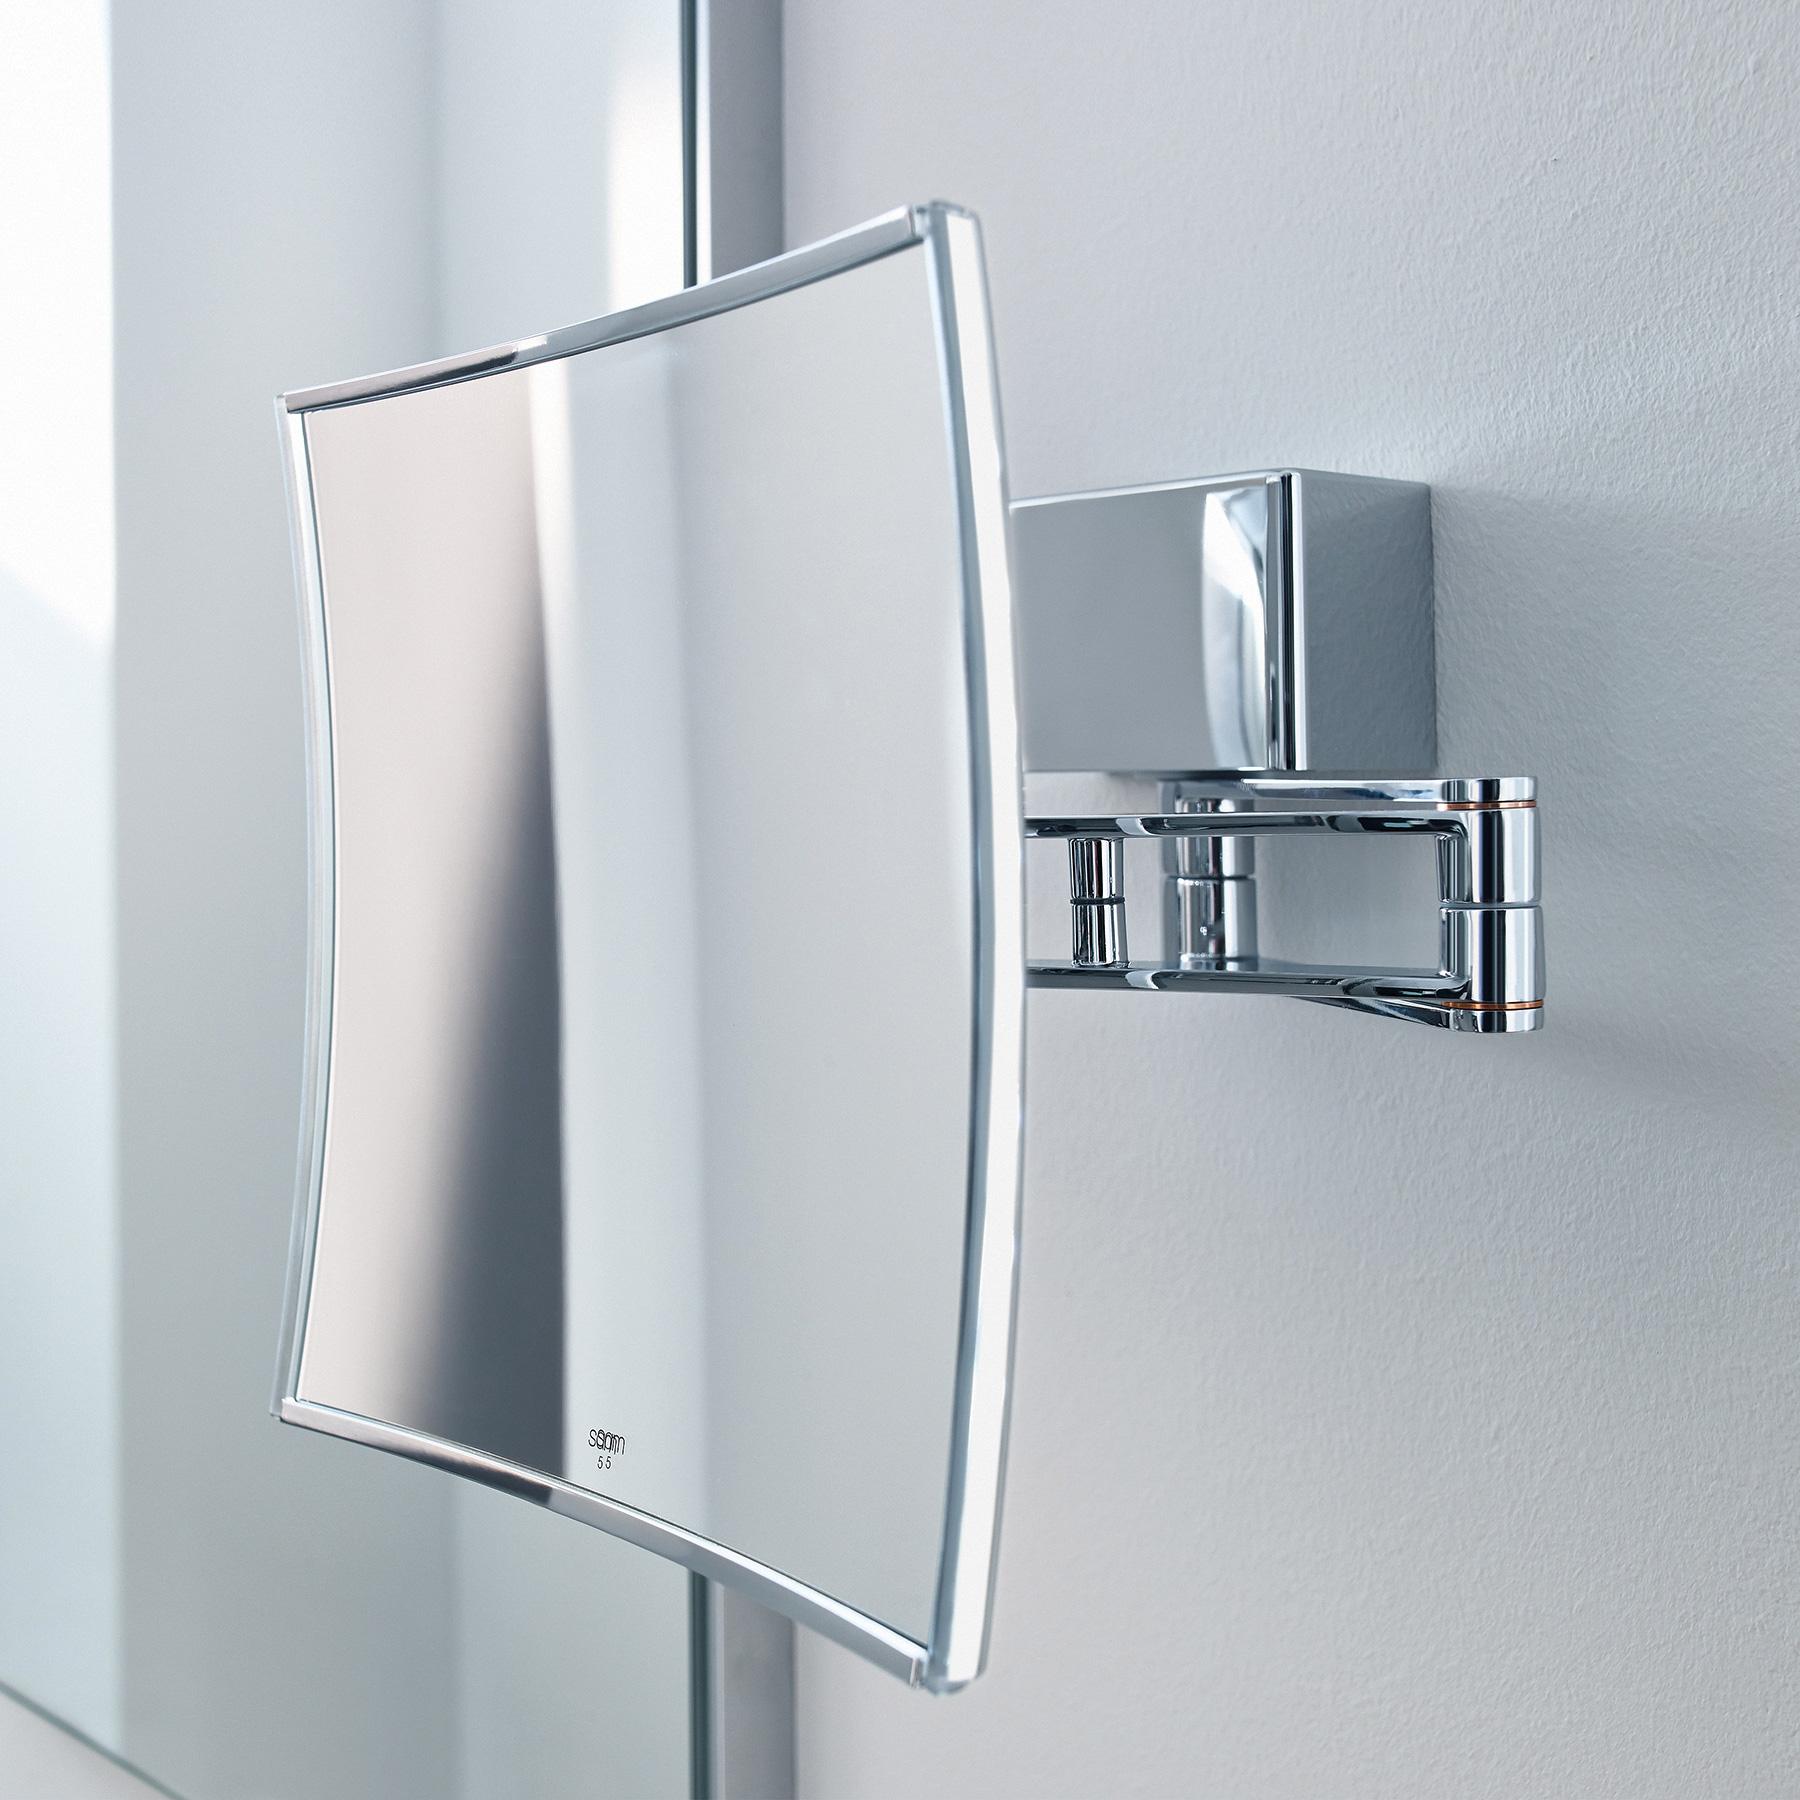 sam miro quadra wand kosmetikspiegel ausladung 340 mm 5 fach vergr erung led 5503870010. Black Bedroom Furniture Sets. Home Design Ideas